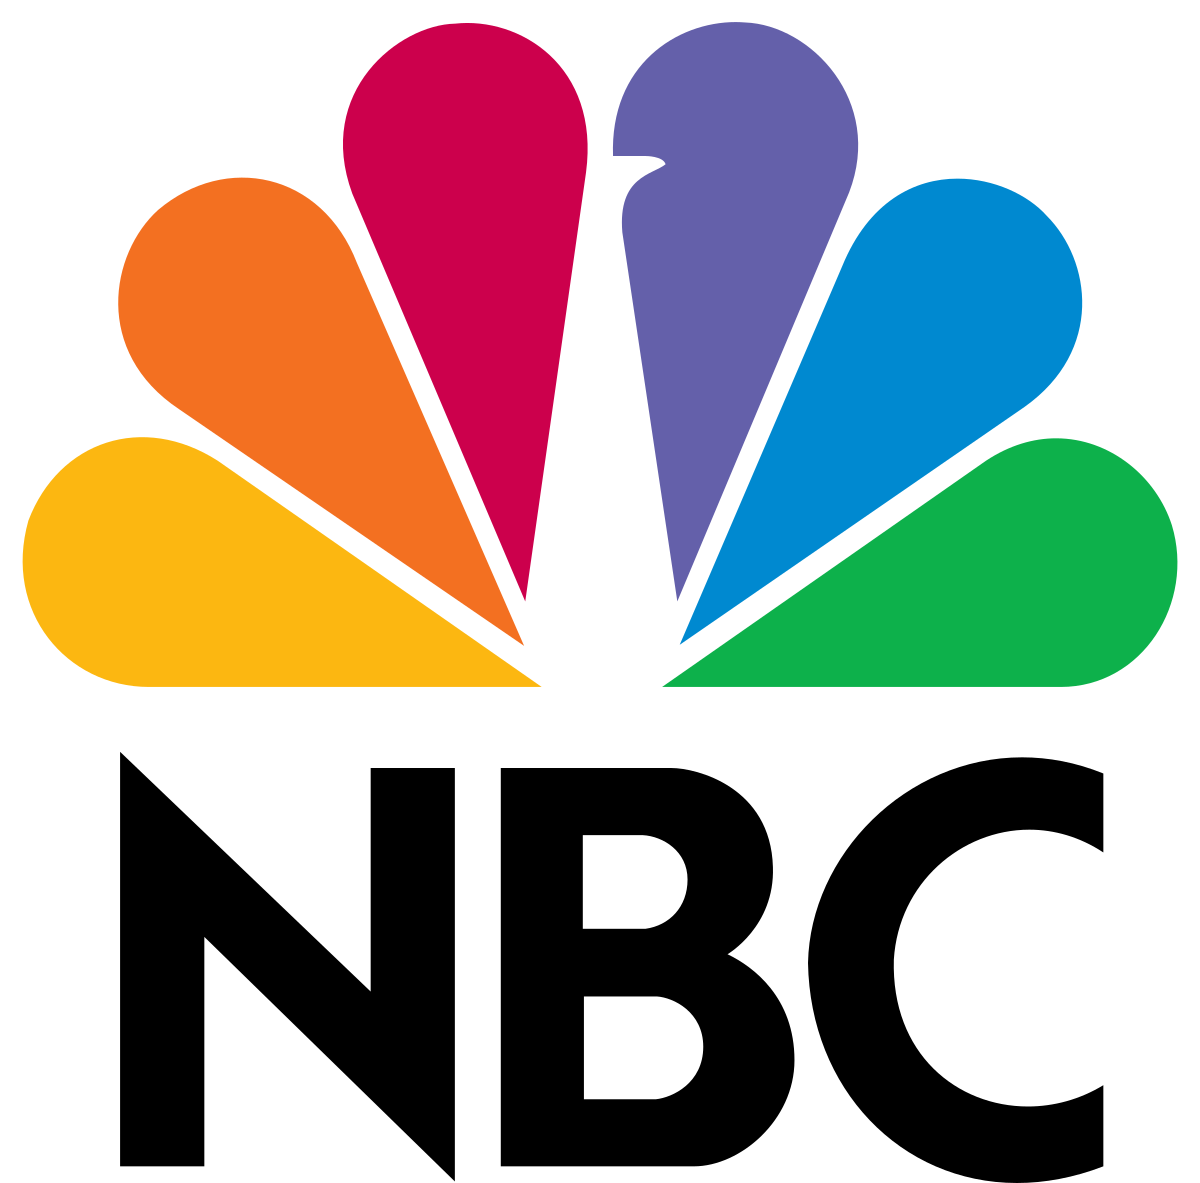 News clipart tv broadcasting. Nbc europe wikipedia